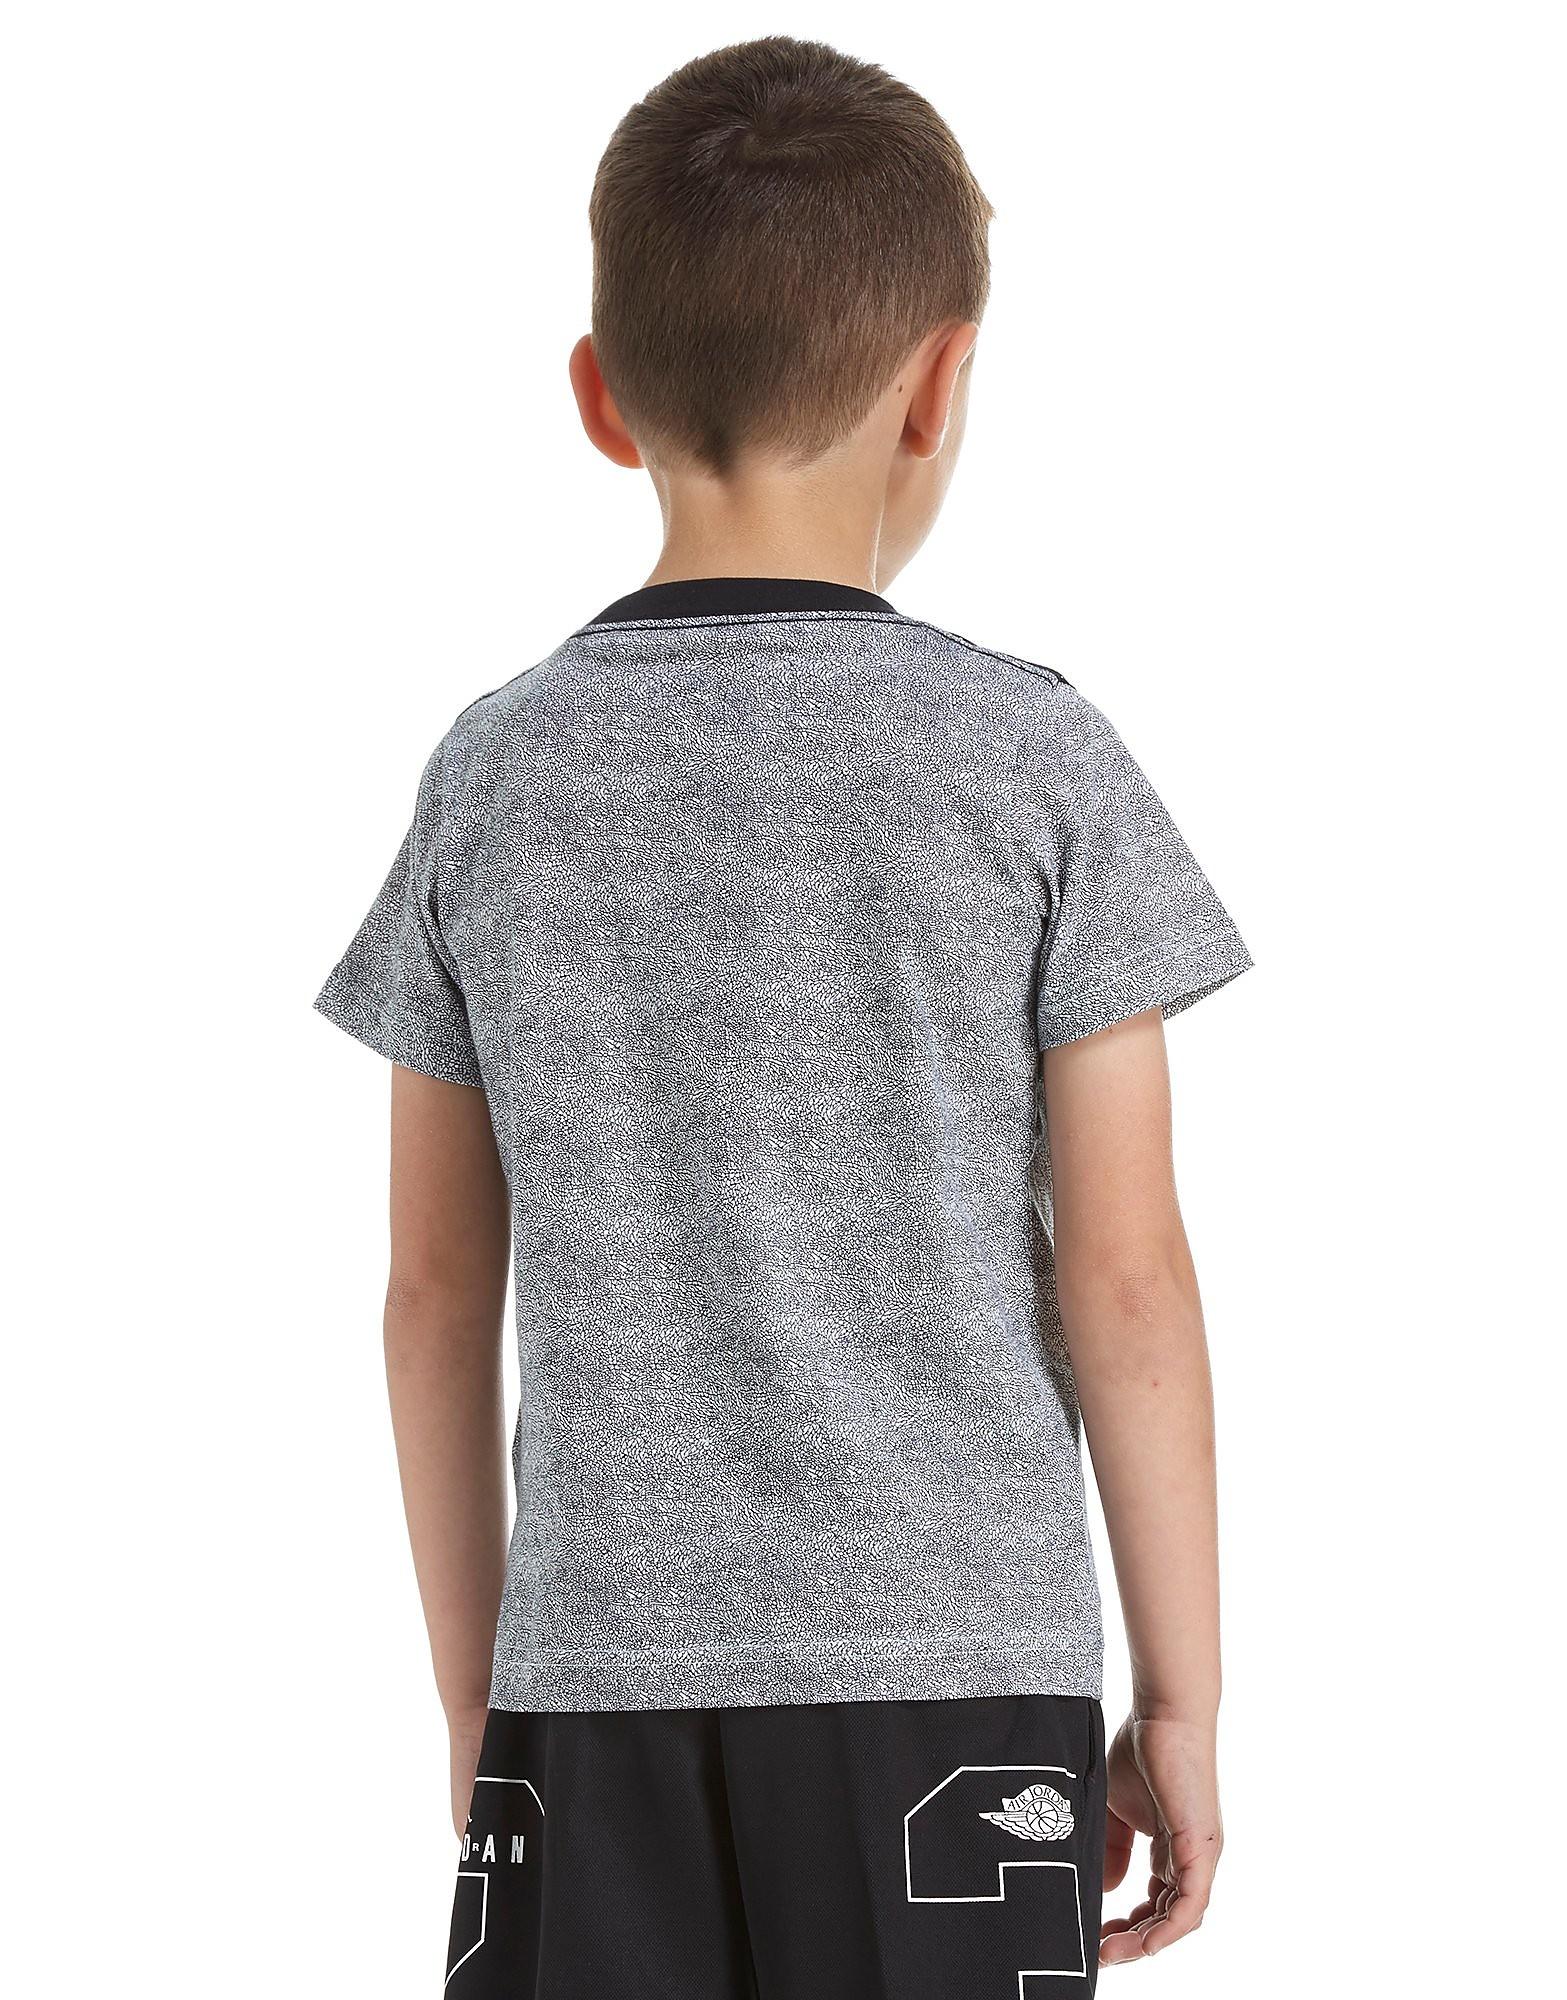 Jordan Micro Ele Print T-Shirt Bambino